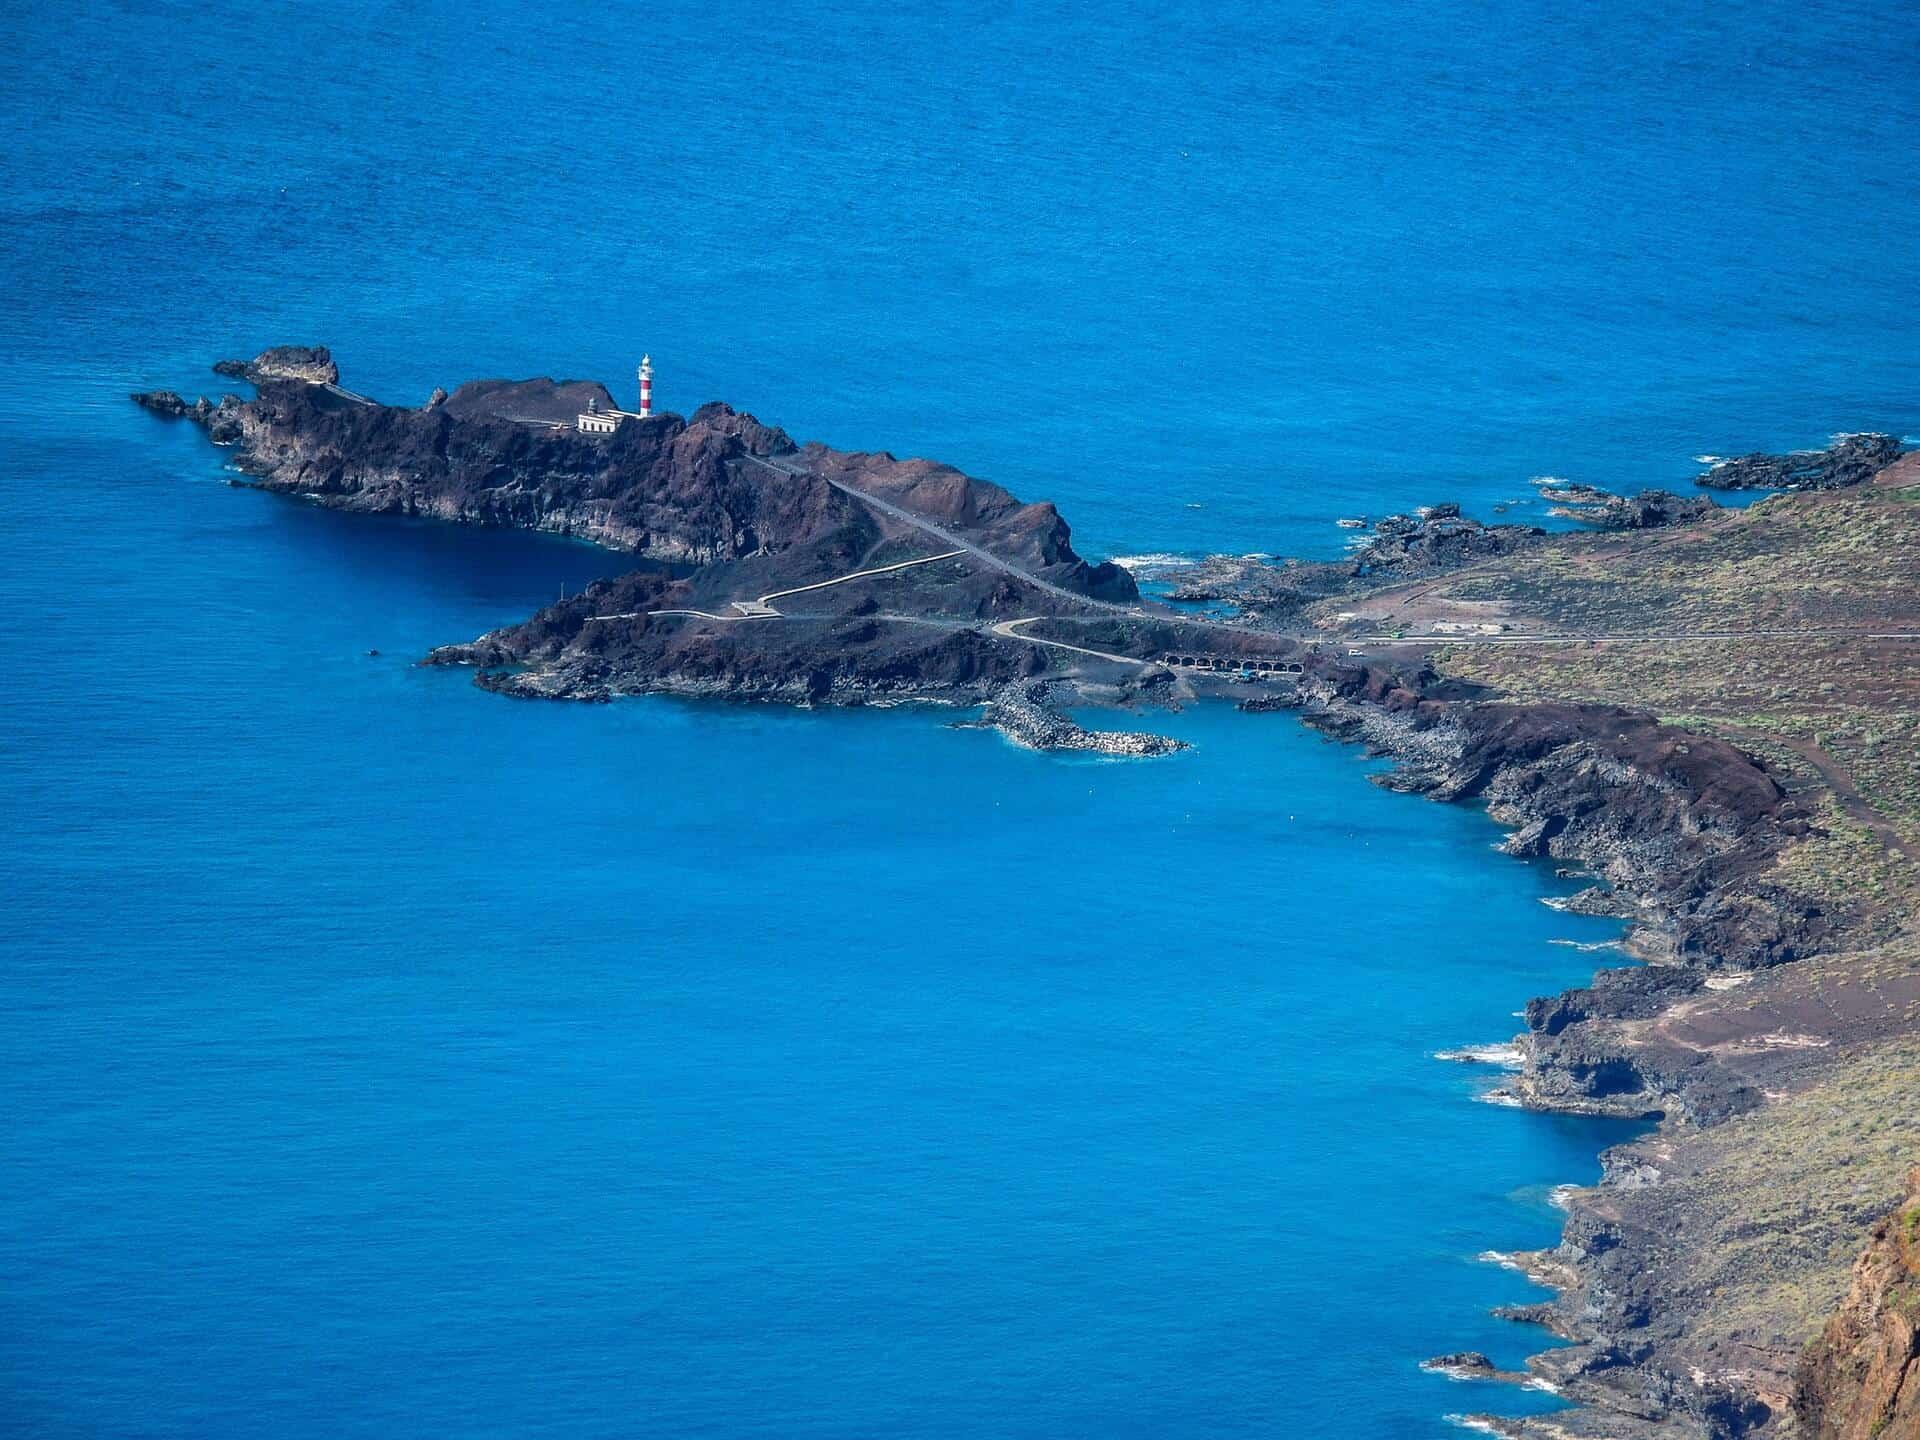 View of the Punta de Teno lighthouse in Tenerife